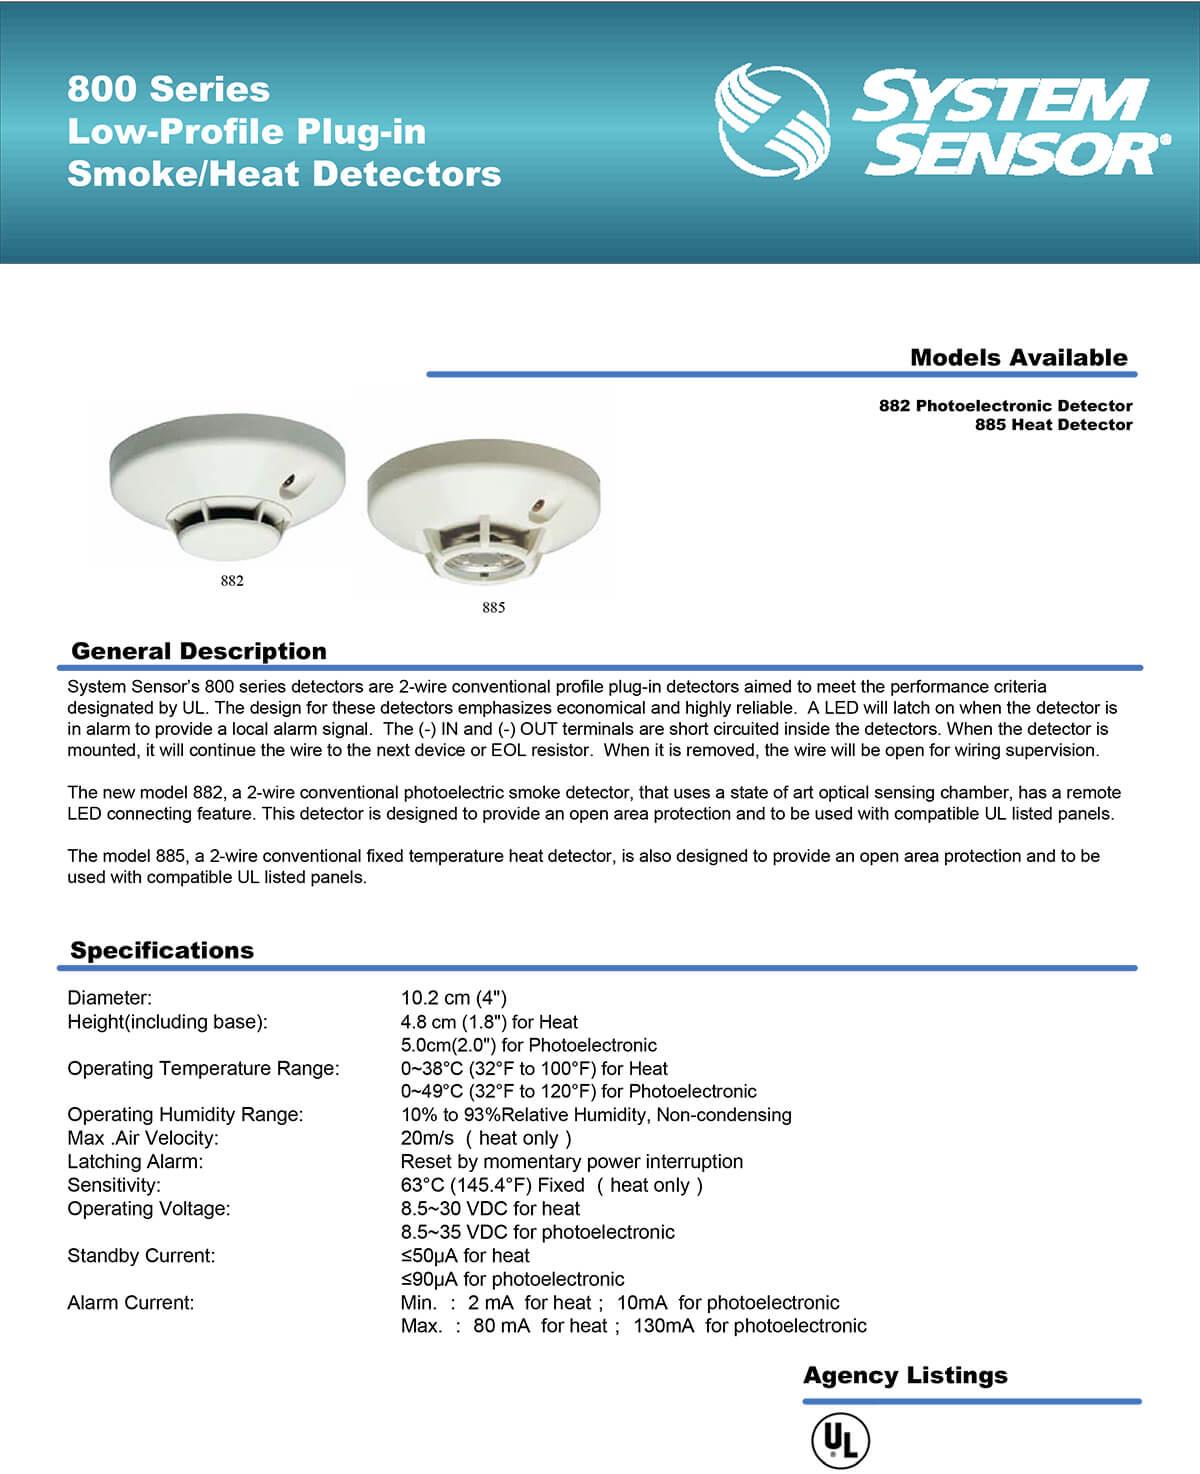 Low-Profile Plug-in Smoke/Heat Detector 800 Series